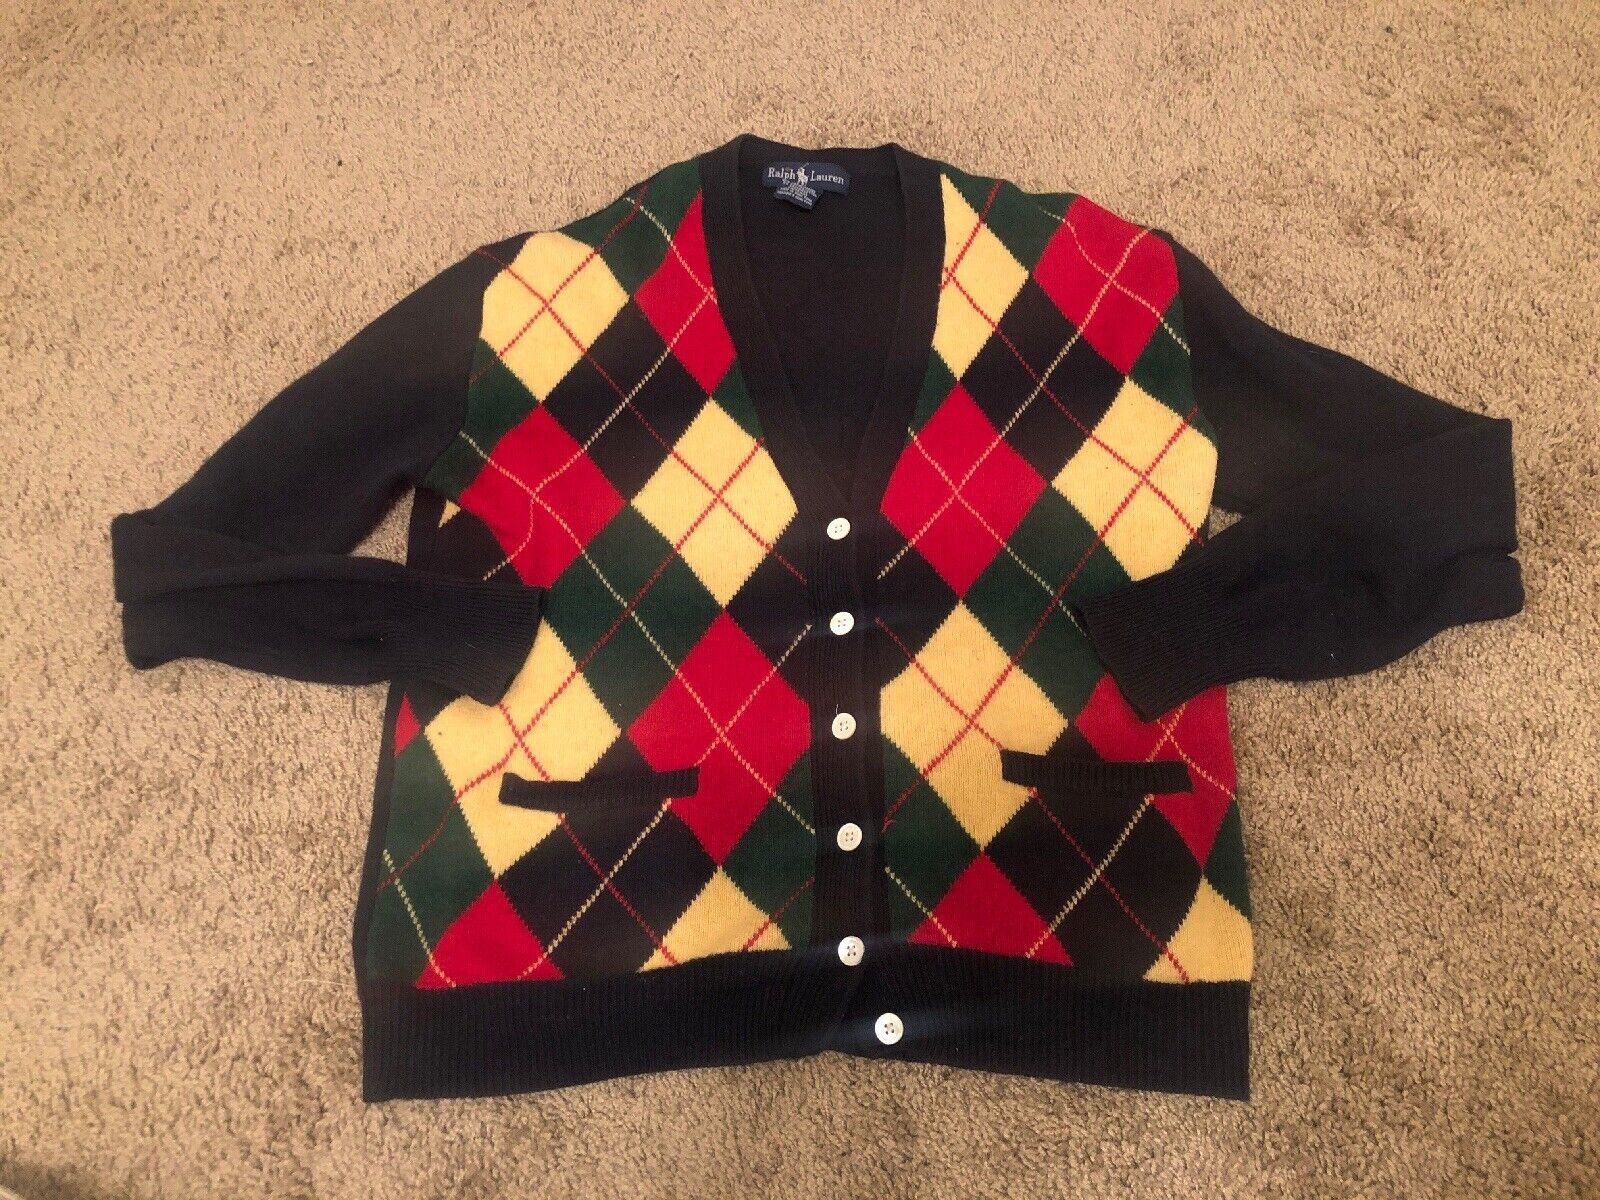 VTG Polo Ralph Lauren Diamond Plaid Cardigan Preppy Sweater Large